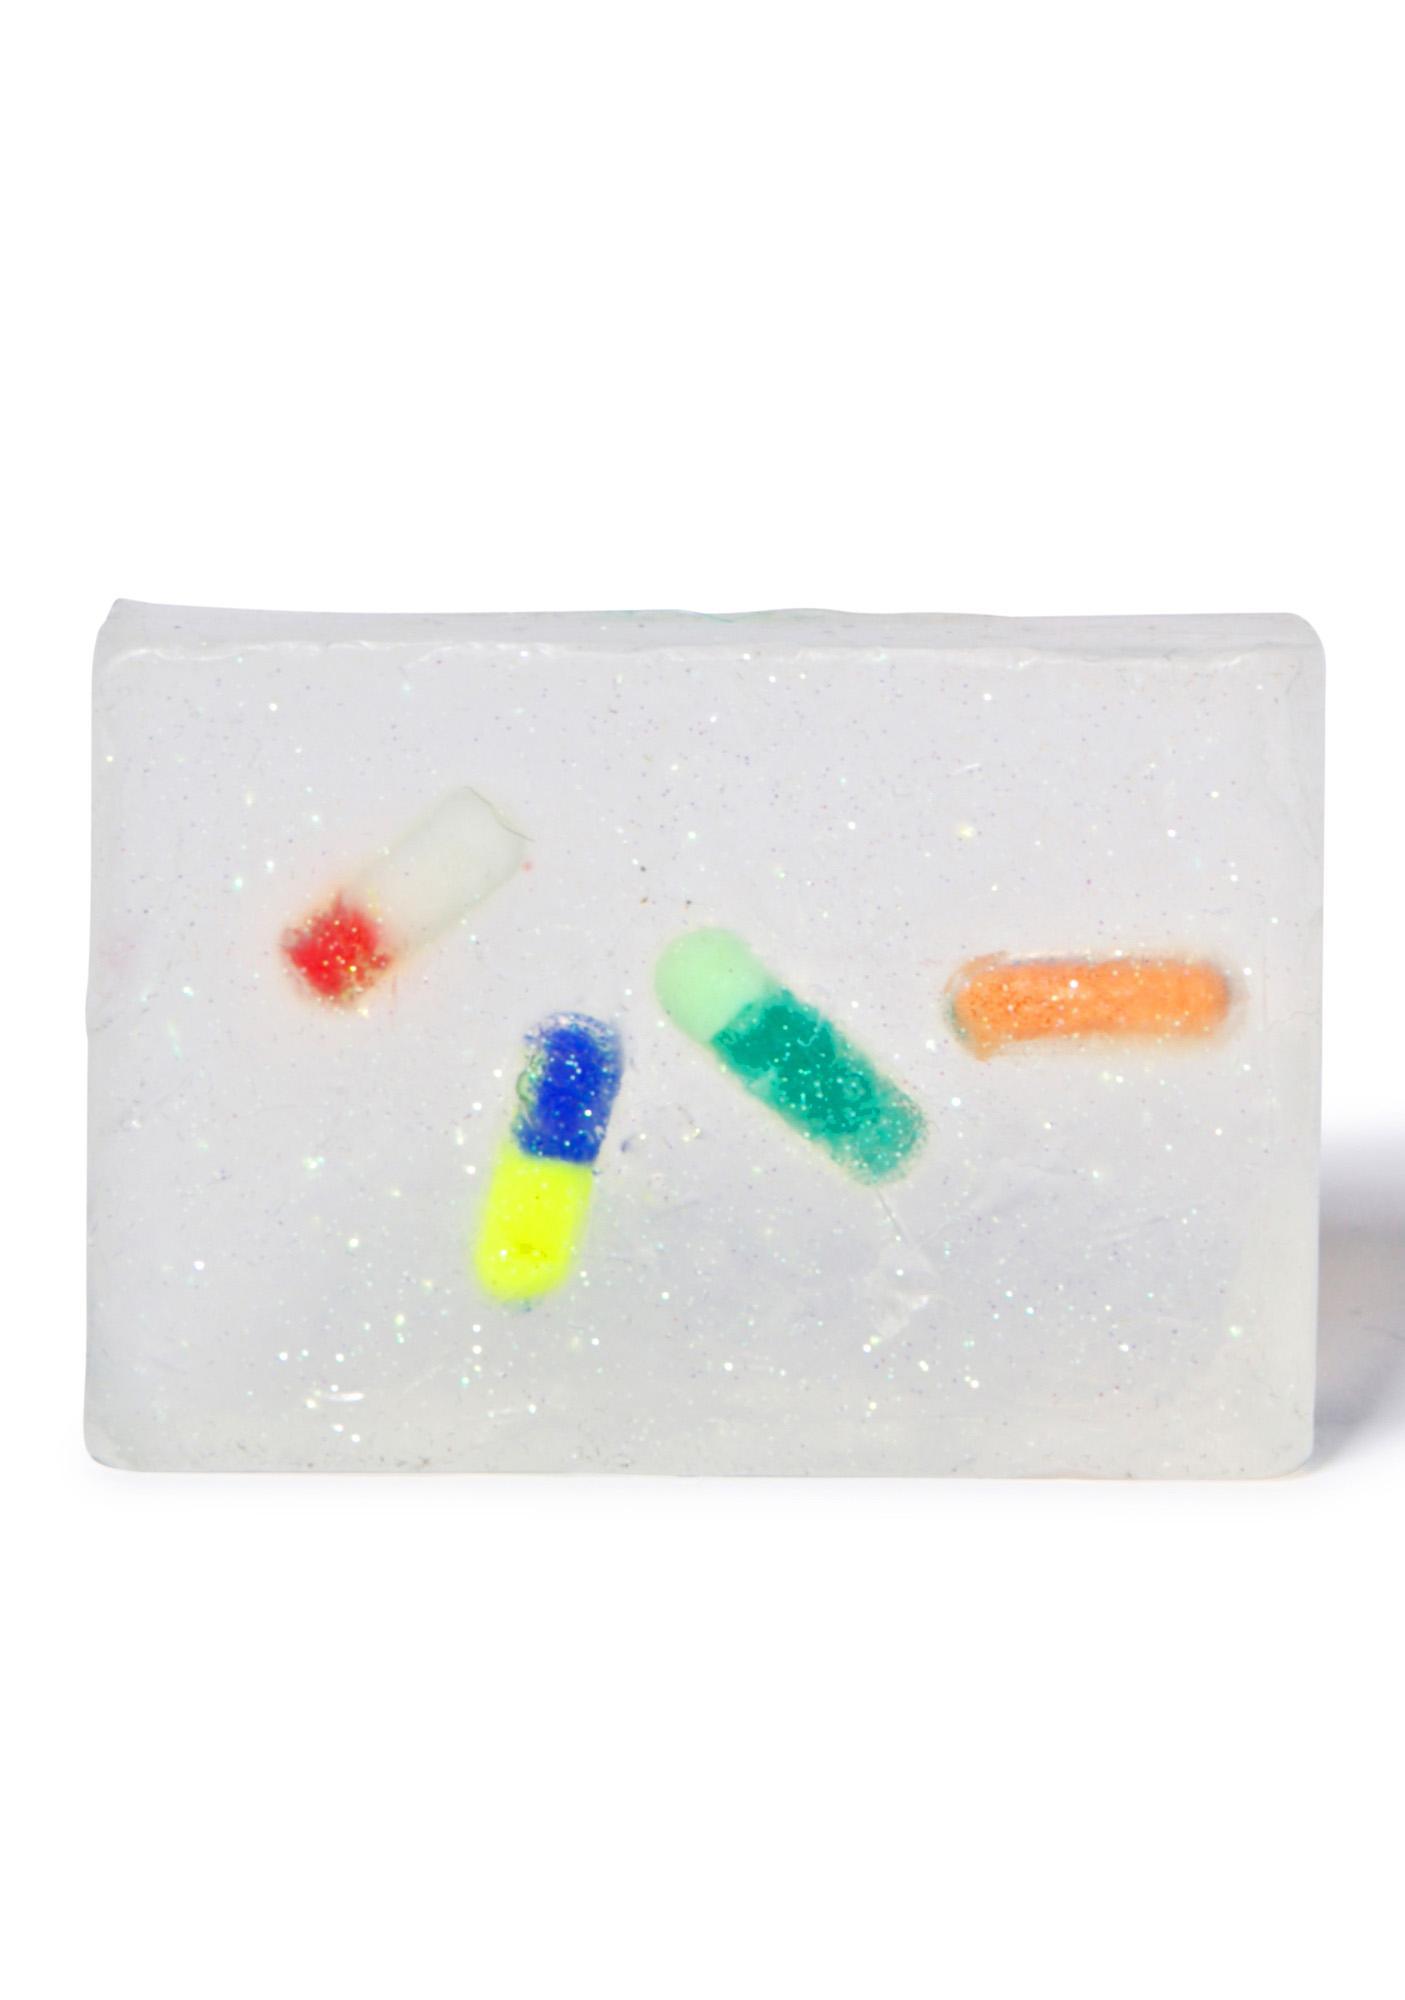 Dirty Grl Sober Soap